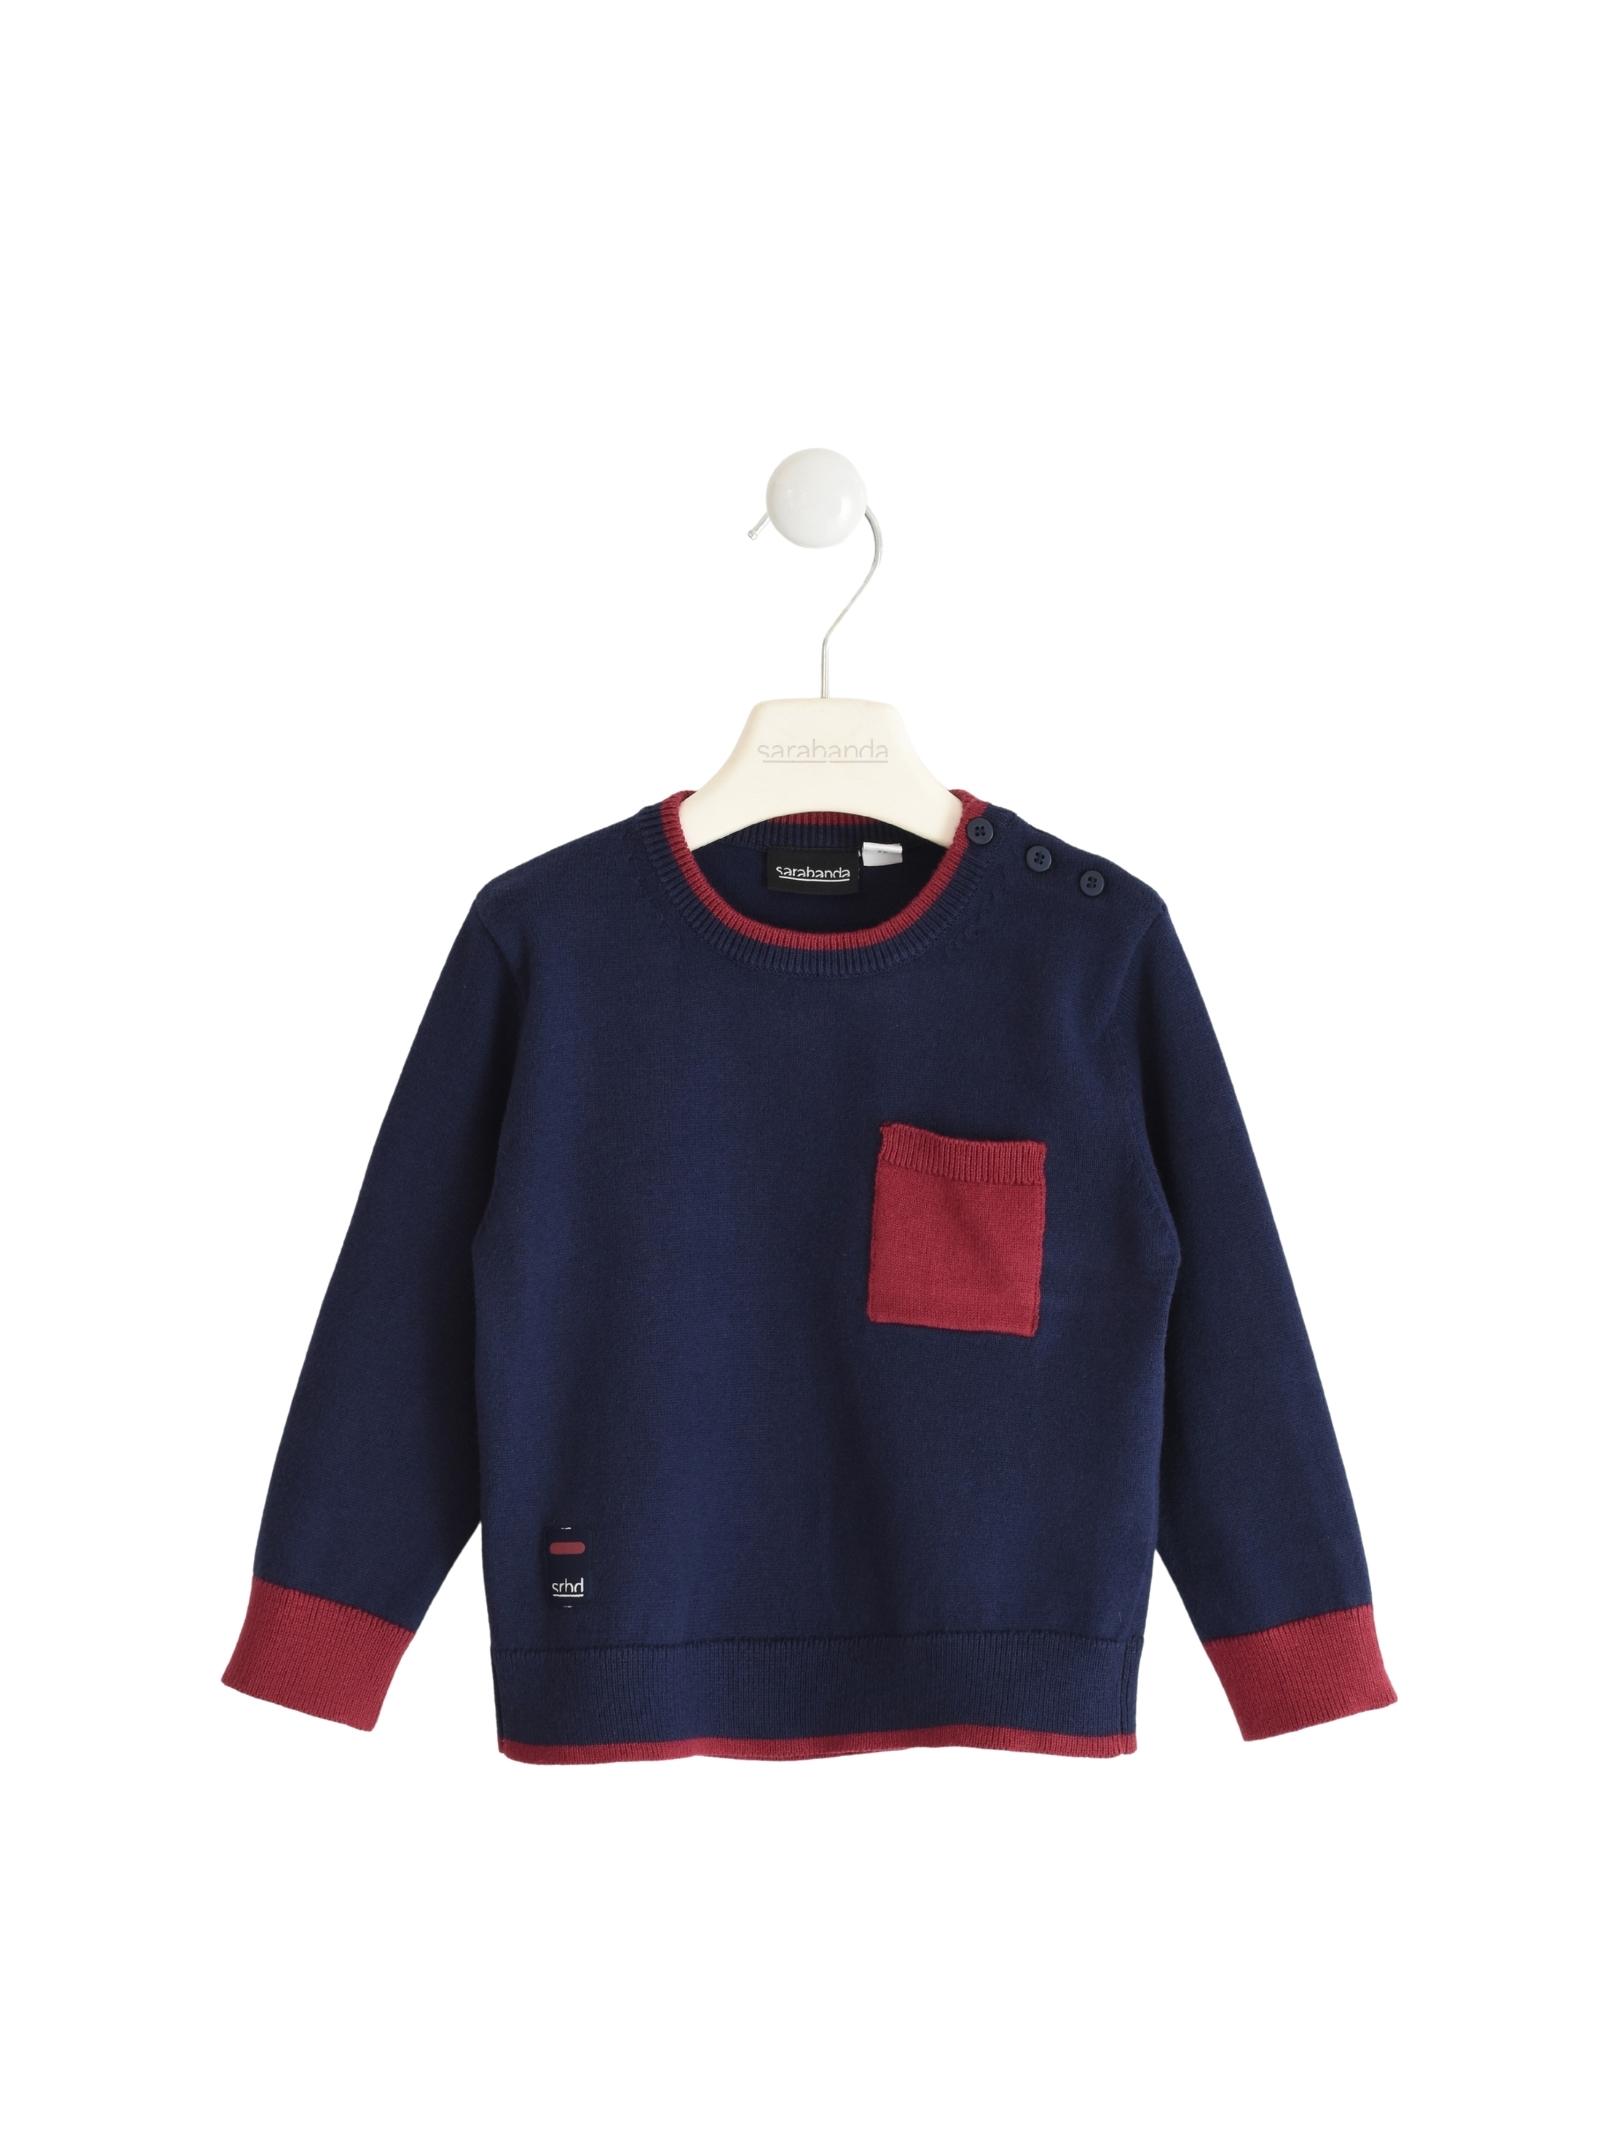 Contrast Baby Sweater SARABANDA | Sweaters | 03100003854